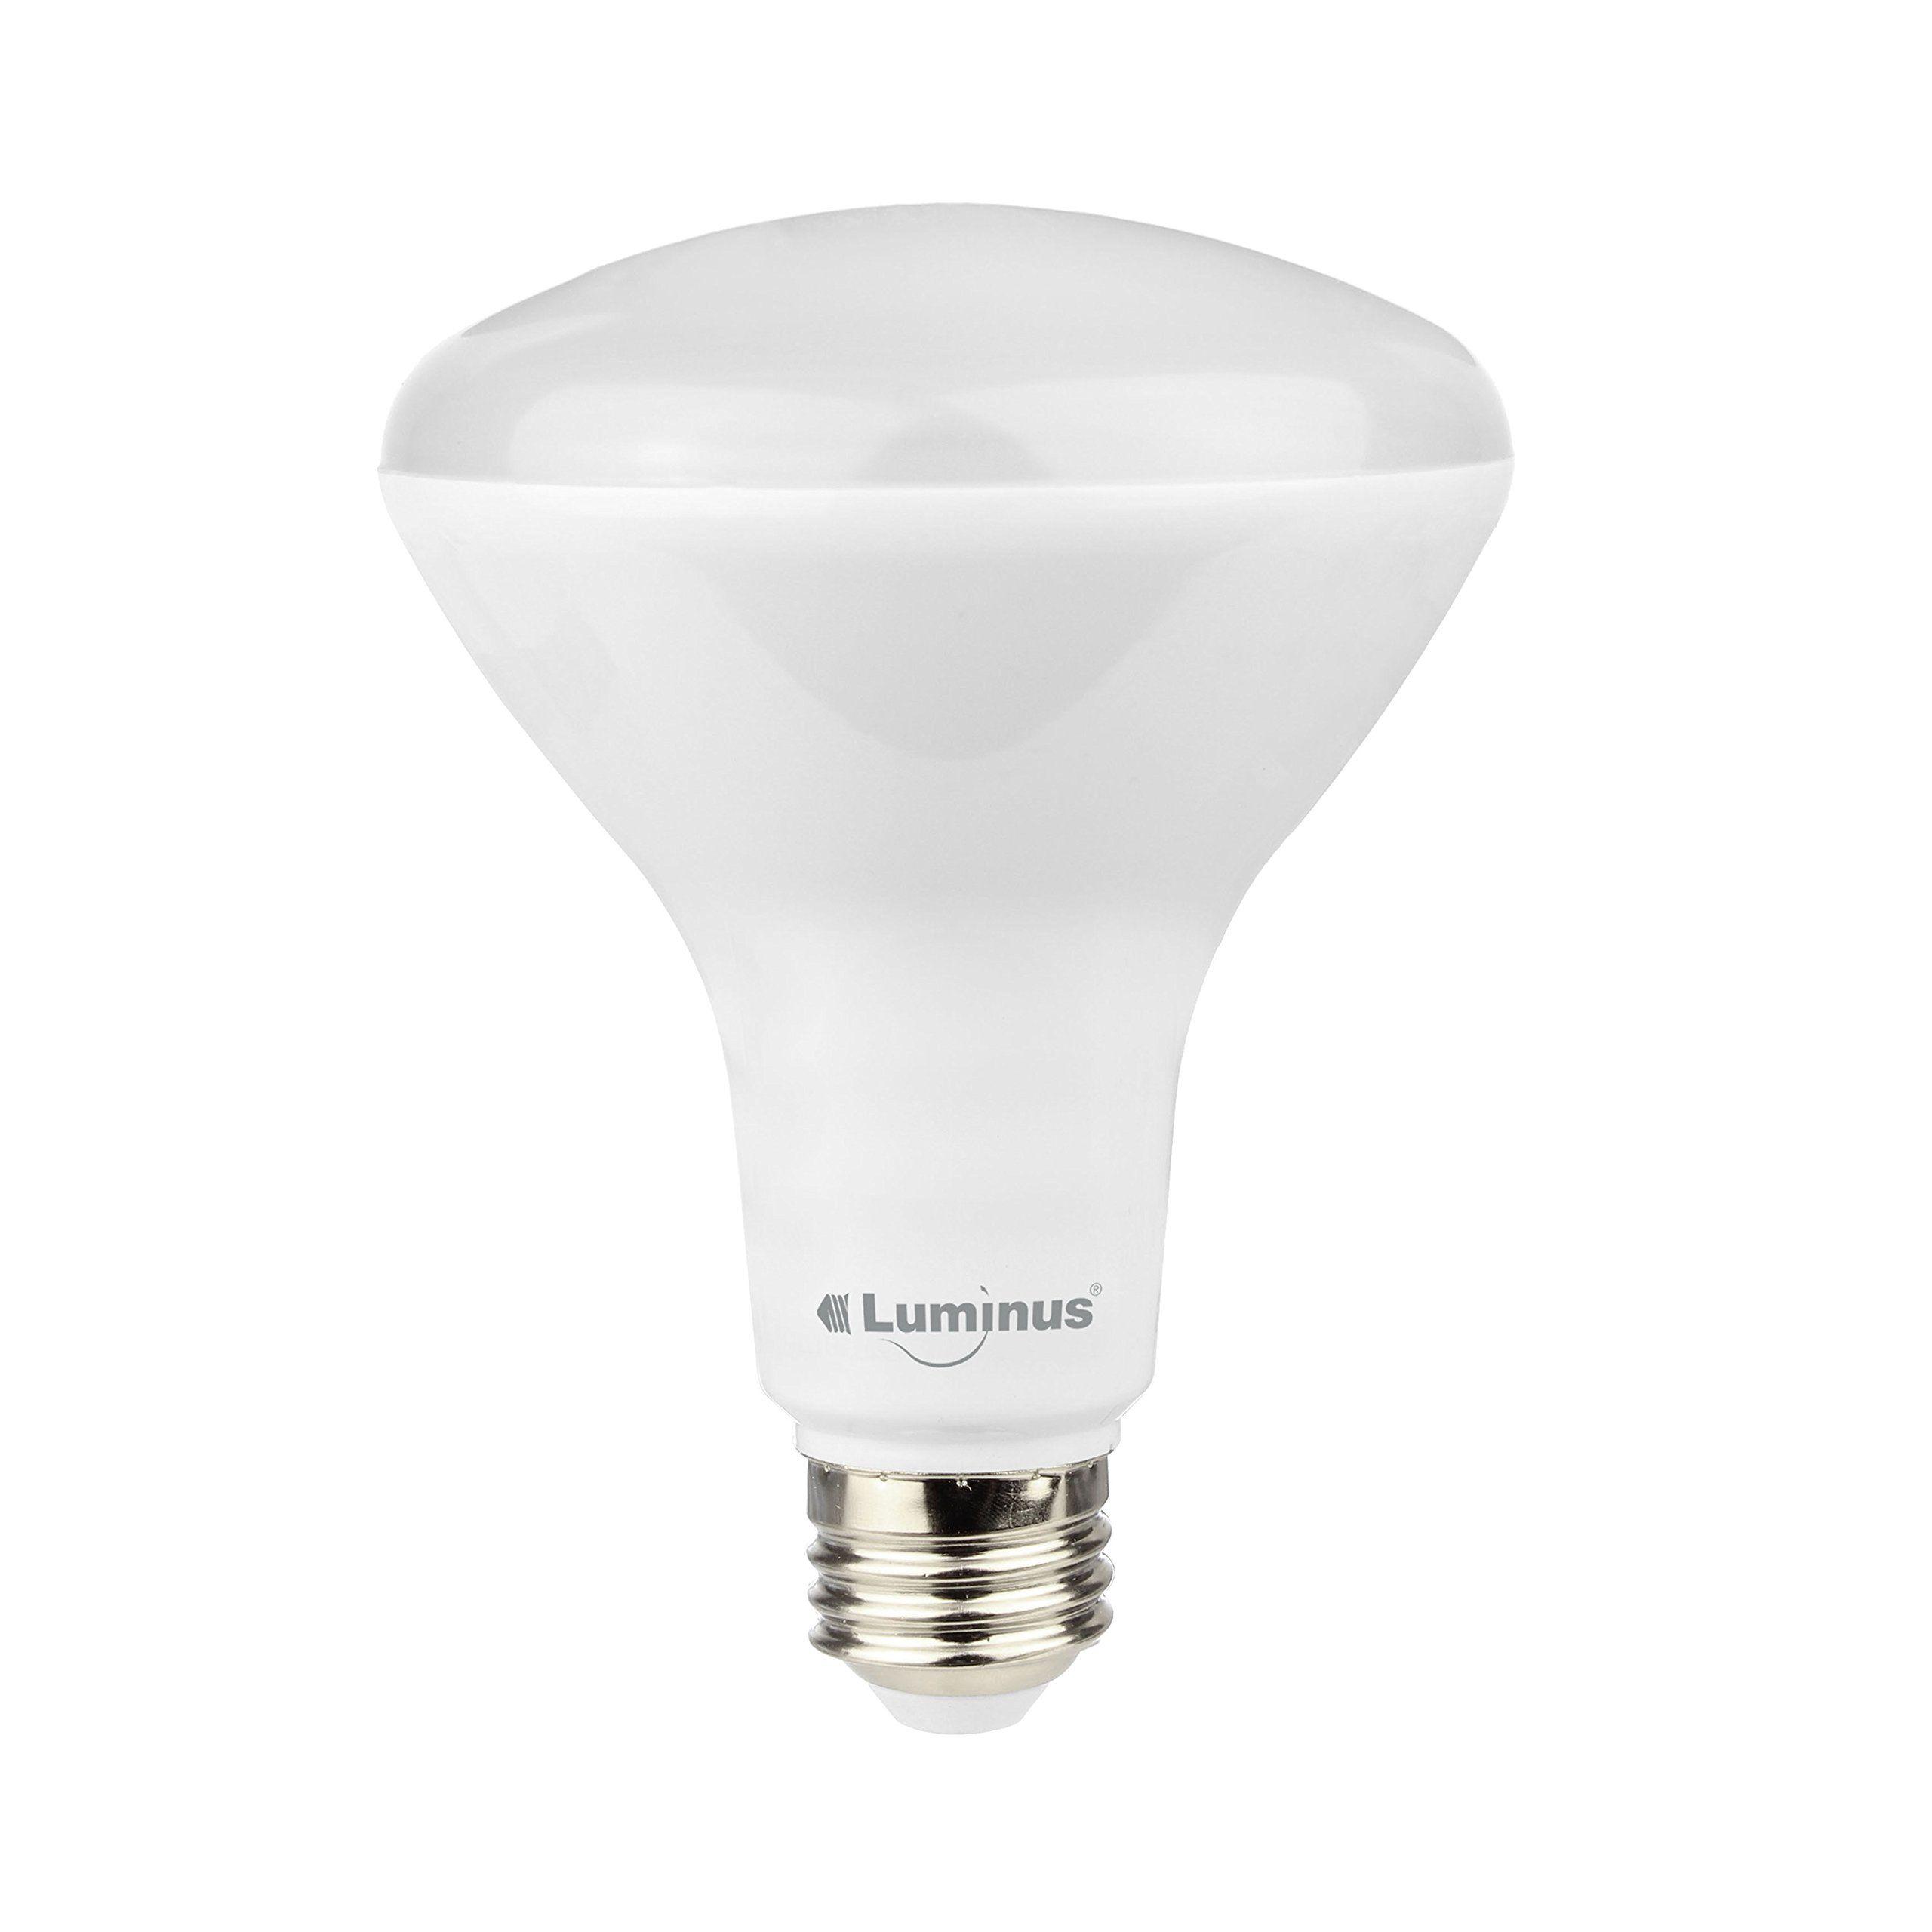 Luminus Plyc5232 Br30 11w 65w 850 Lumens Warm White 2700k